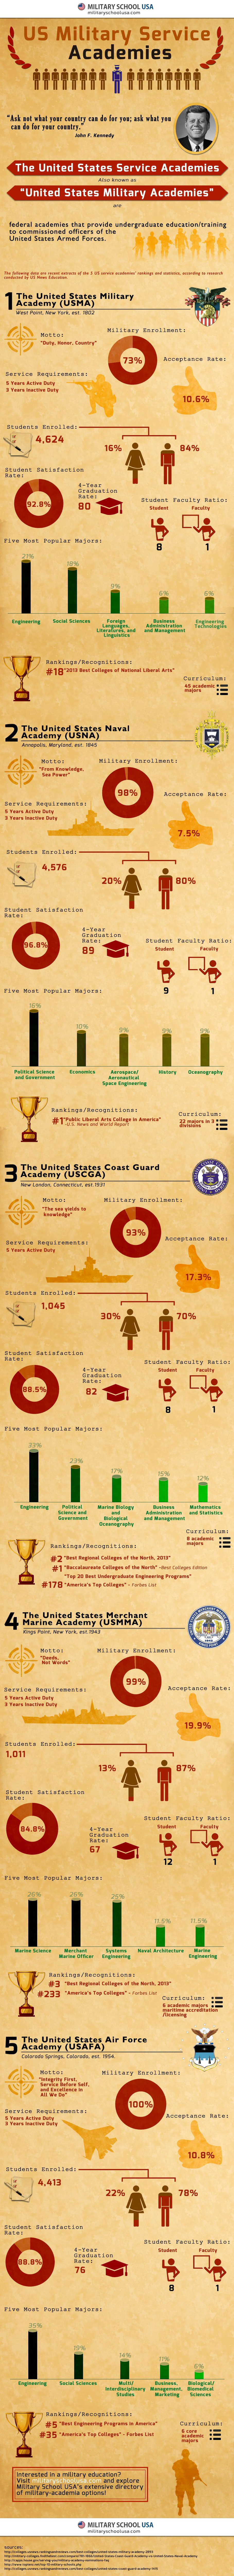 US Military Service Academies